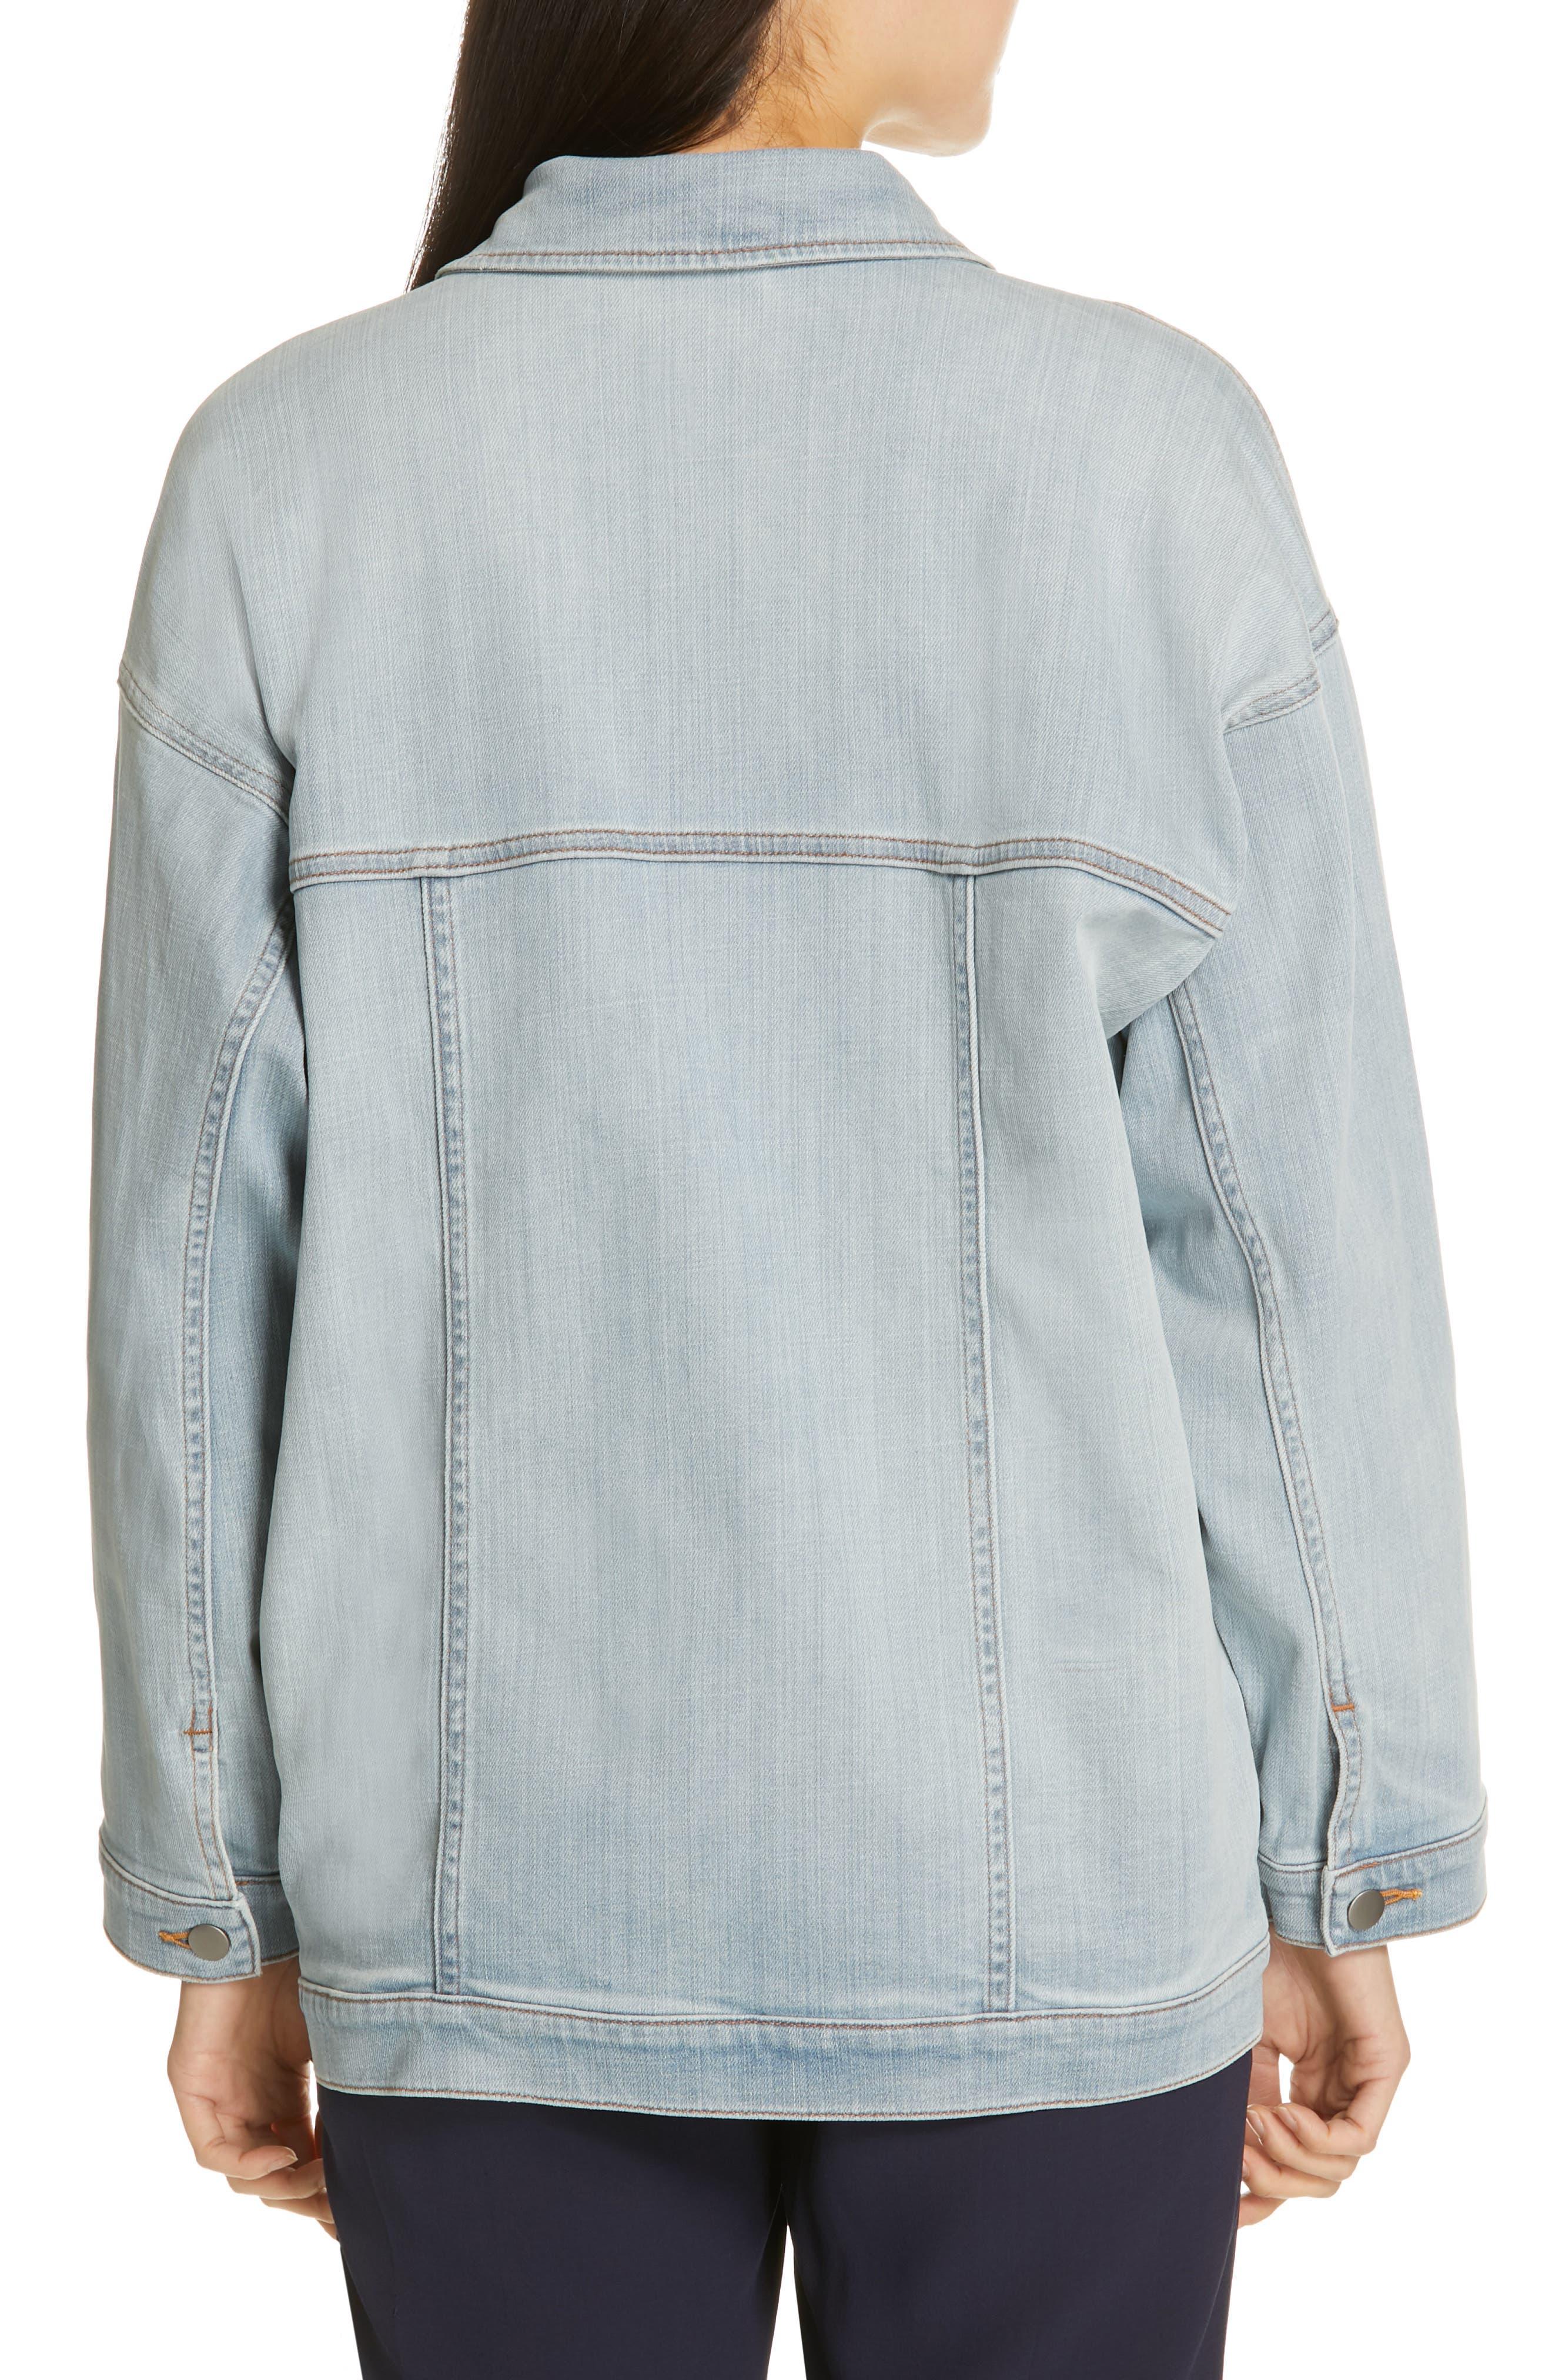 Oversize Stretch Organic Cotton Denim Jacket,                             Alternate thumbnail 2, color,                             ICE BLUE